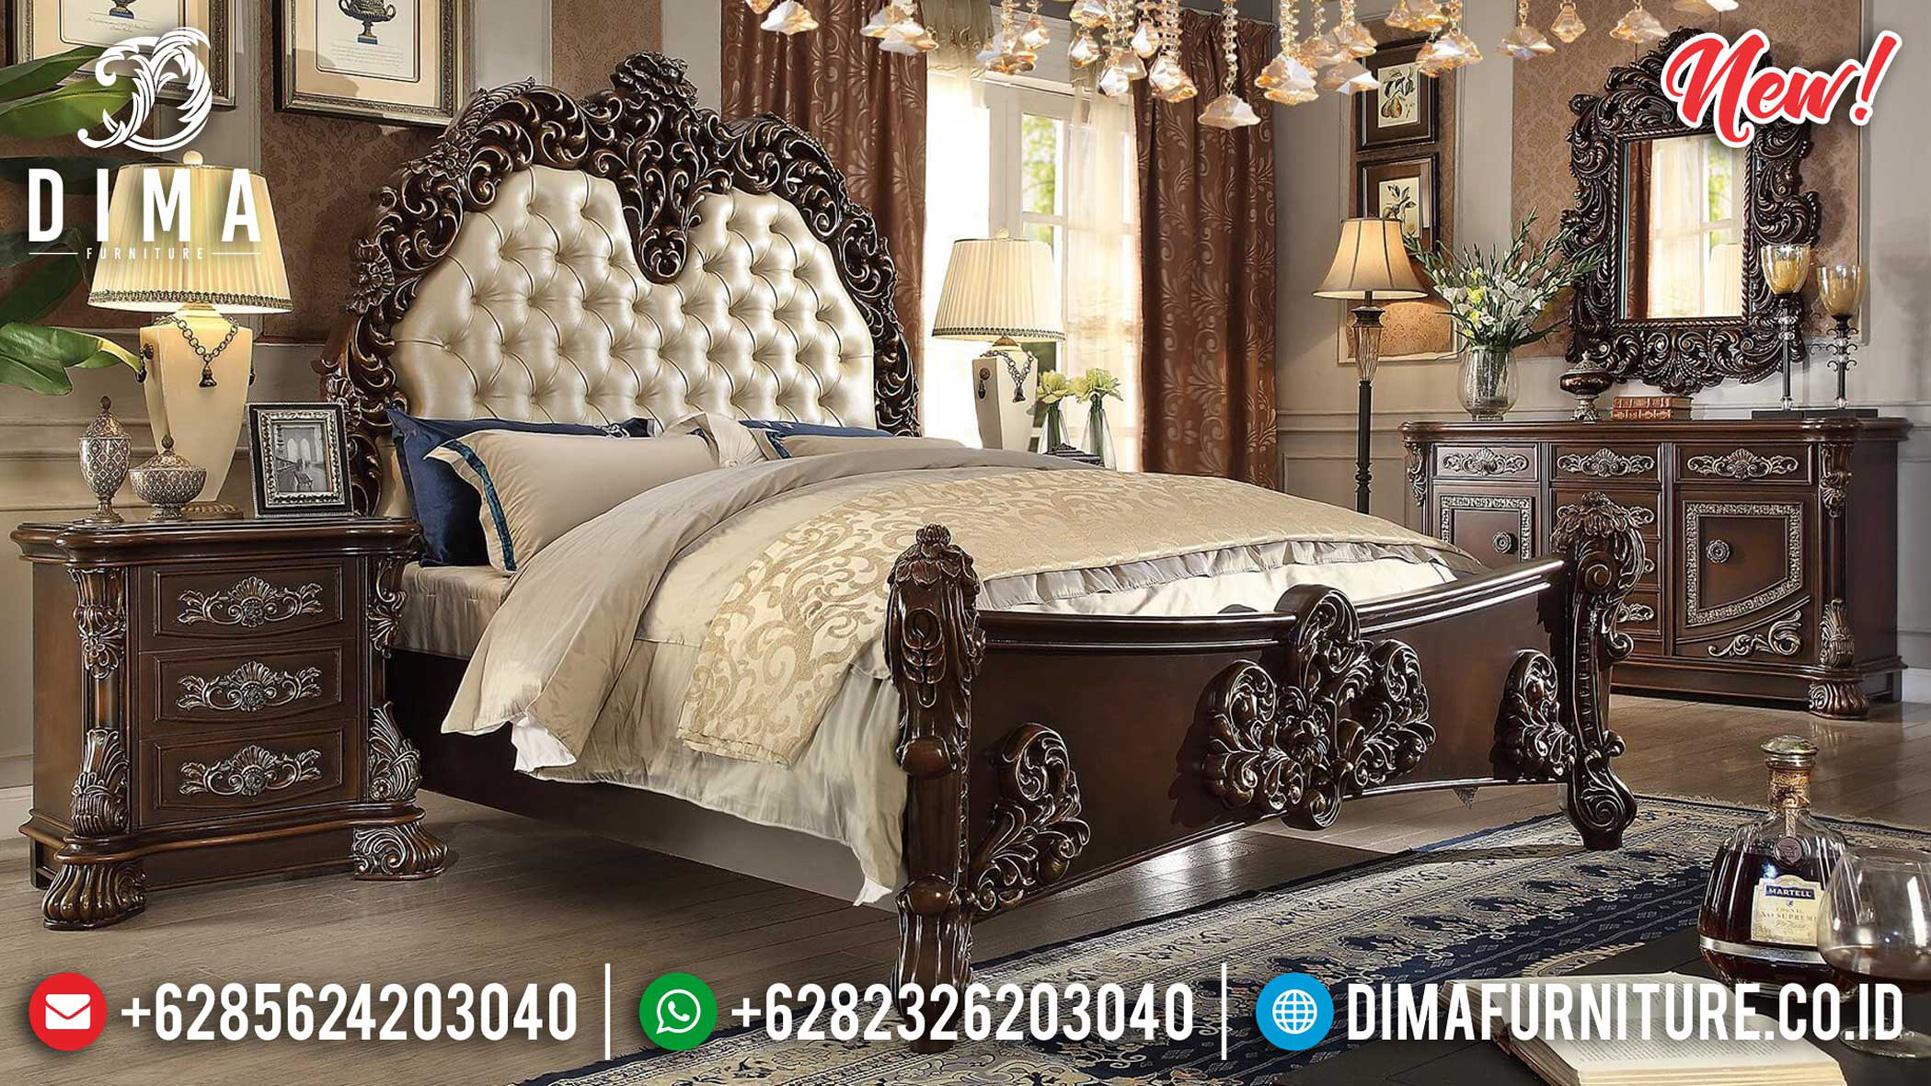 Model Set Tempat Tidur Mewah Jepara Luxury High Class Palace Style ST-1173